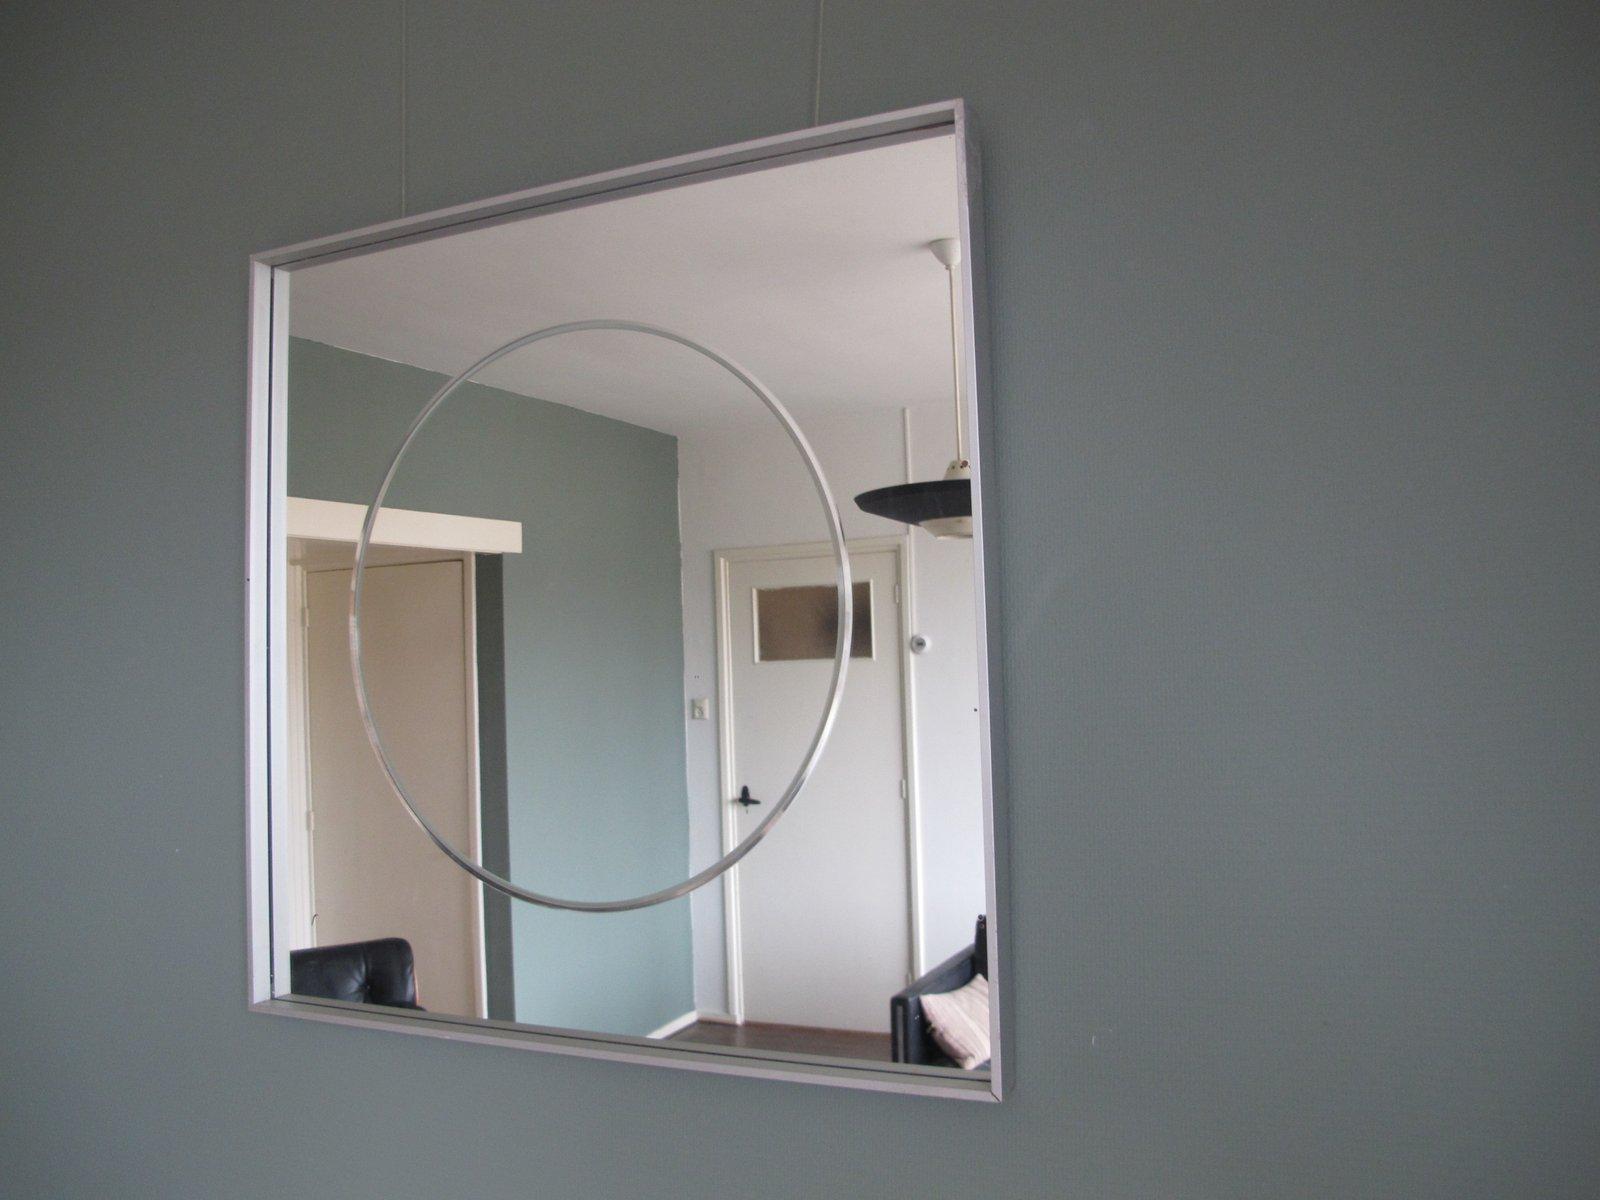 quadratischer vintage spiegel mit aluminium rahmen bei. Black Bedroom Furniture Sets. Home Design Ideas